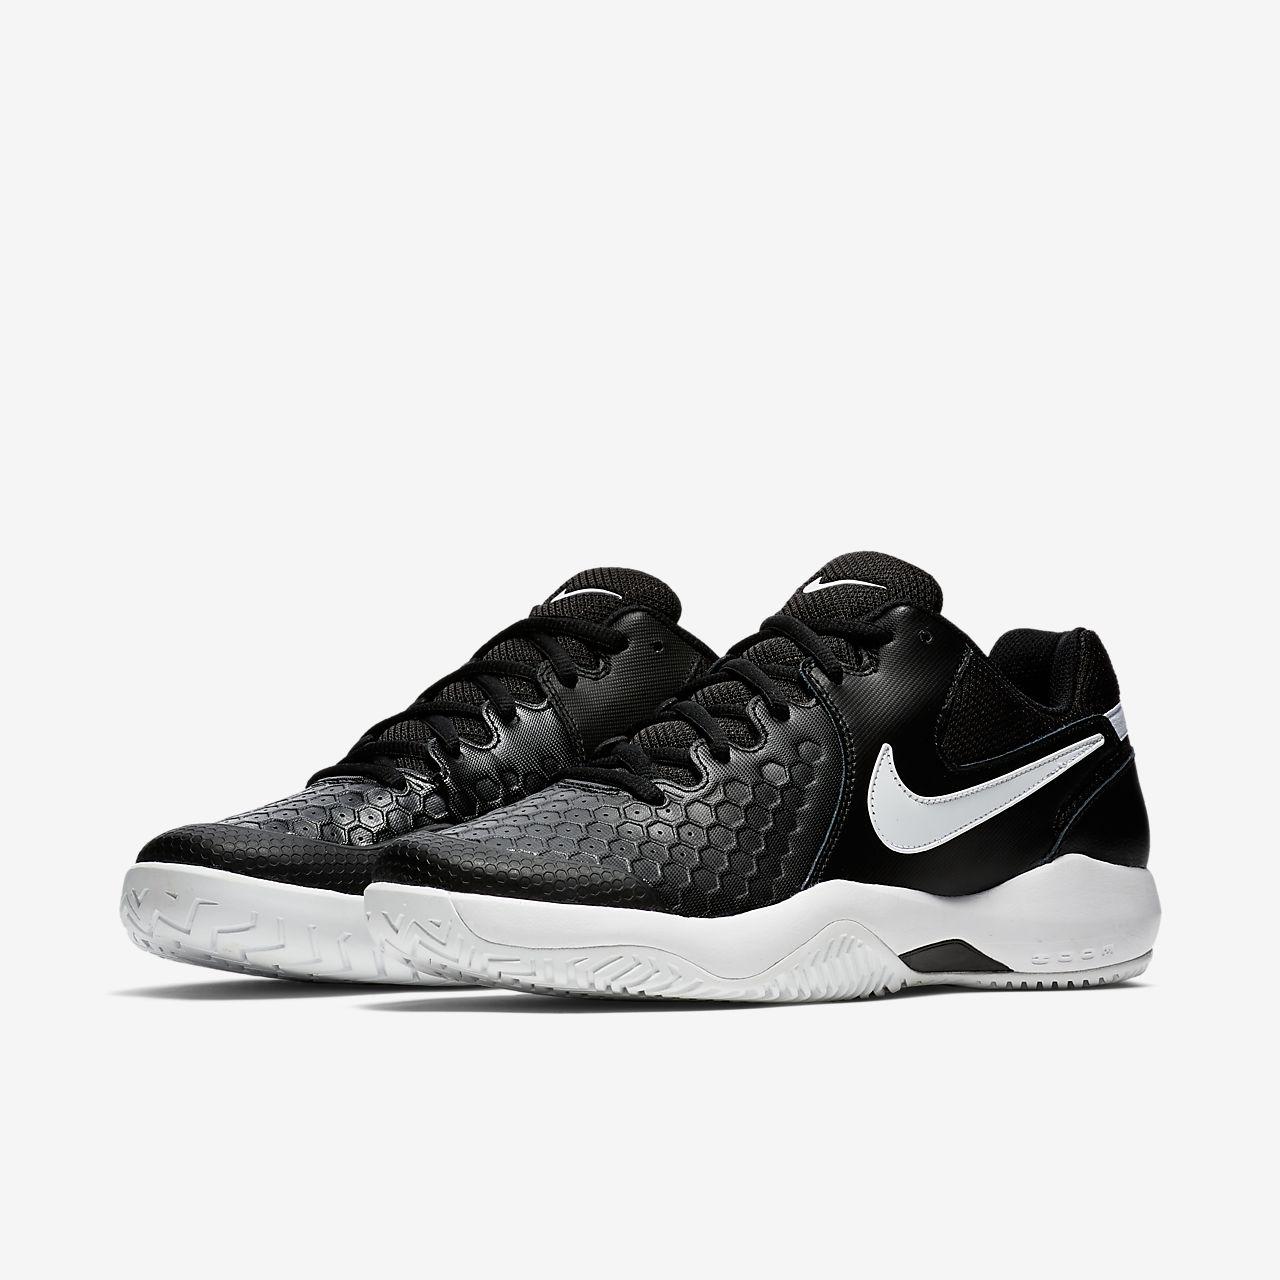 lace up in 100% high quality shoes for cheap Chaussure de tennis pour surface dure NikeCourt Air Zoom Resistance pour  Homme